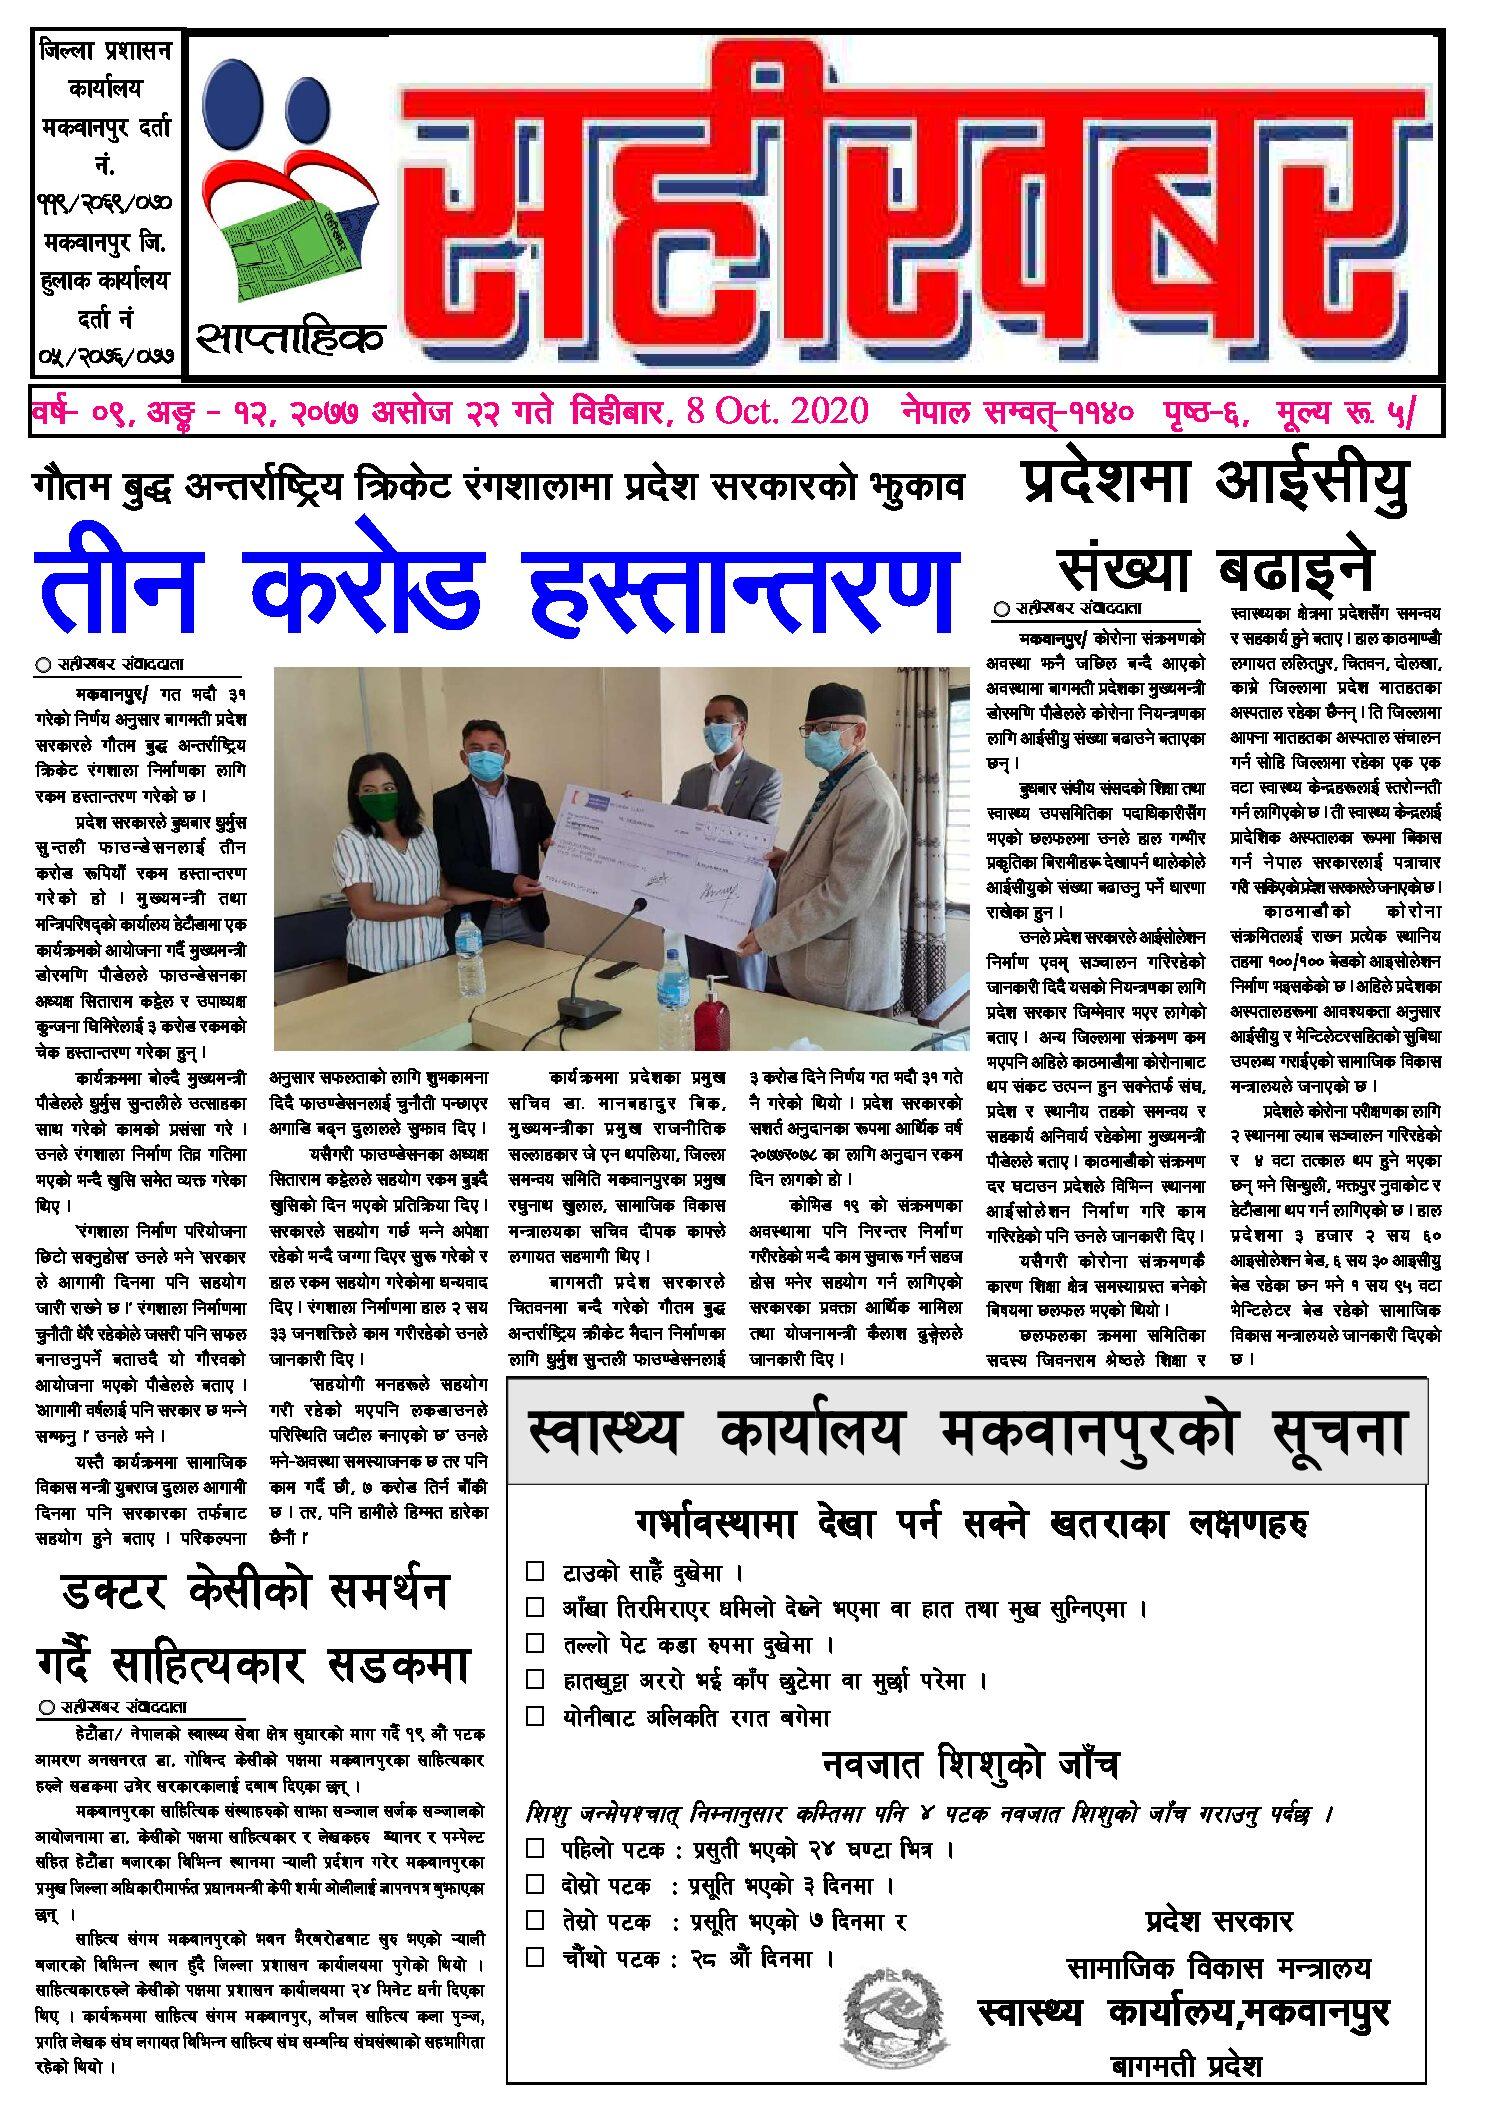 सहीखबर साप्ताहिक